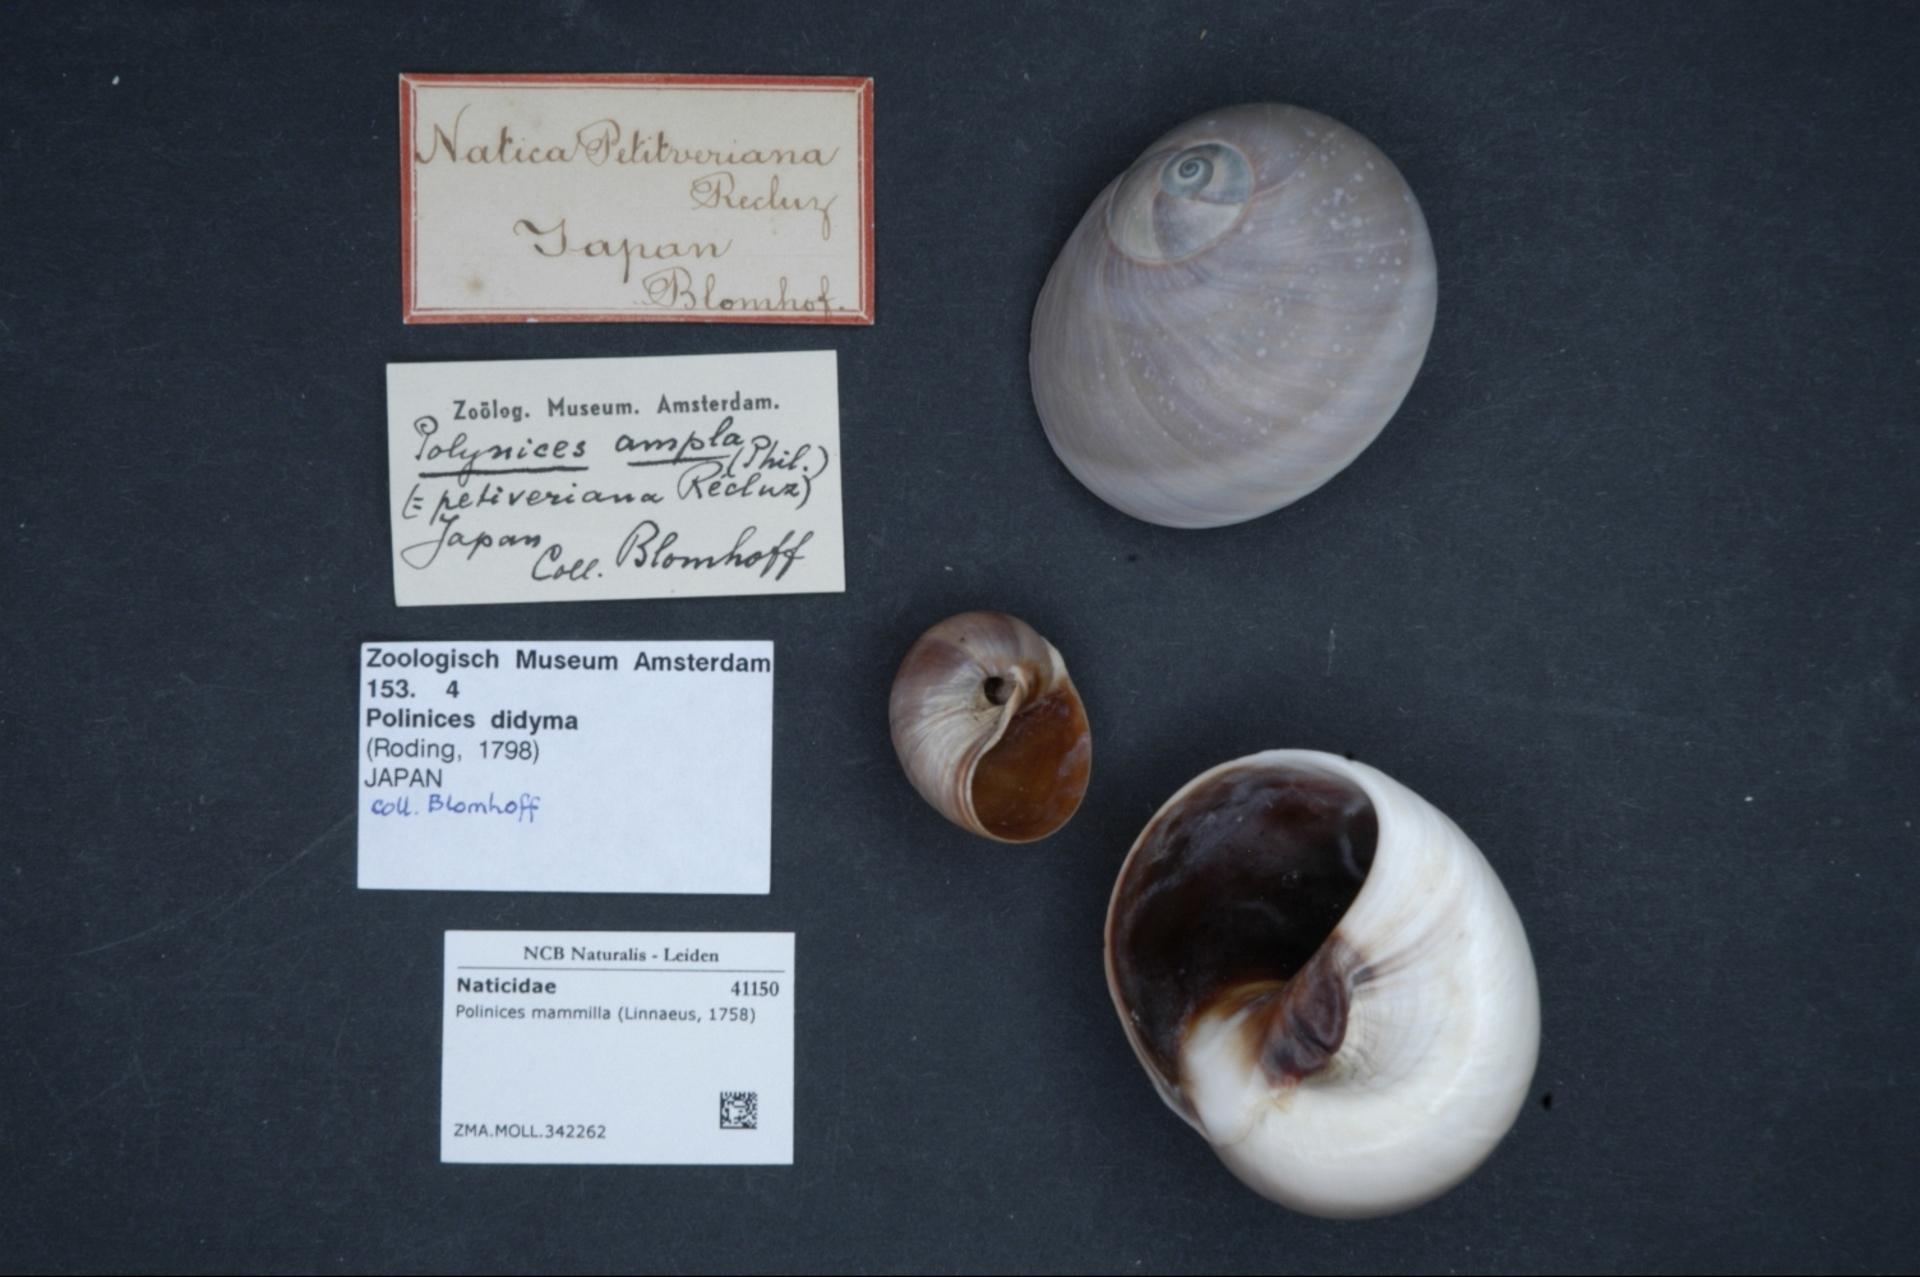 ZMA.MOLL.342262 | Polinices mammilla (Linnaeus, 1758)